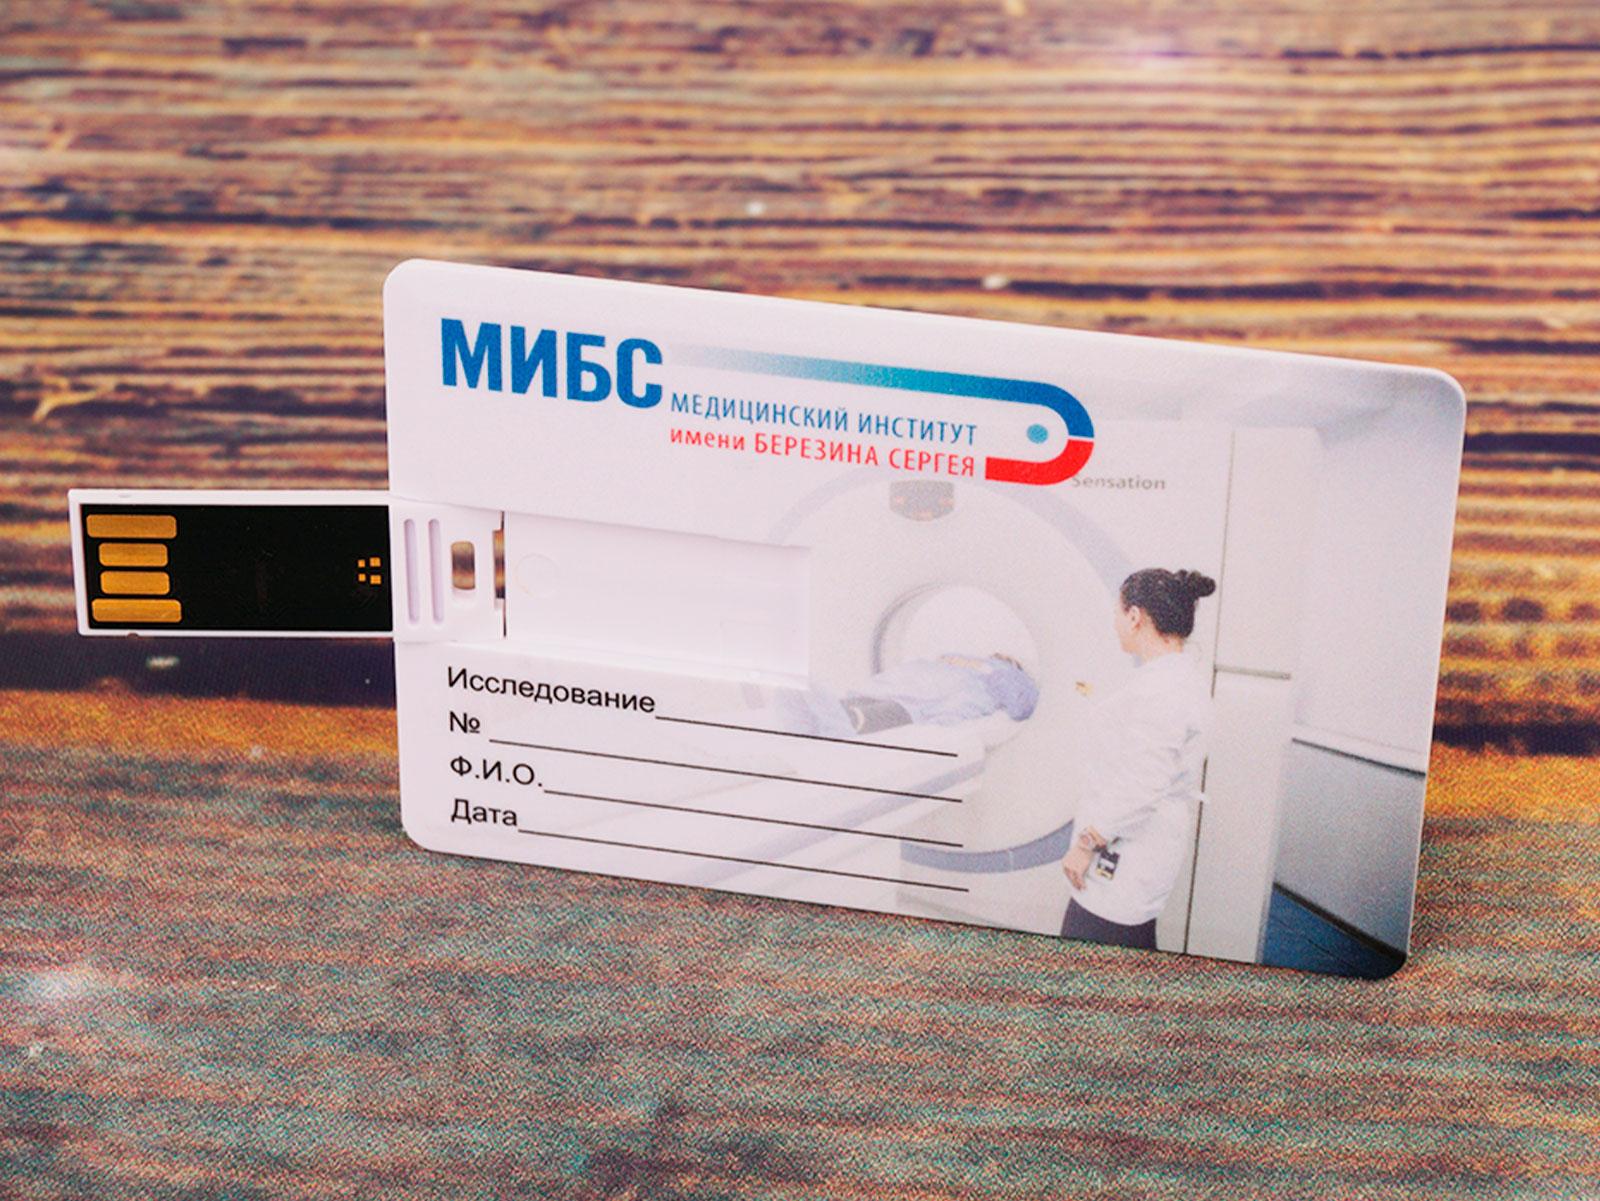 флешка кт мрт сувенирная продукция с логотипом компании оптом Москва